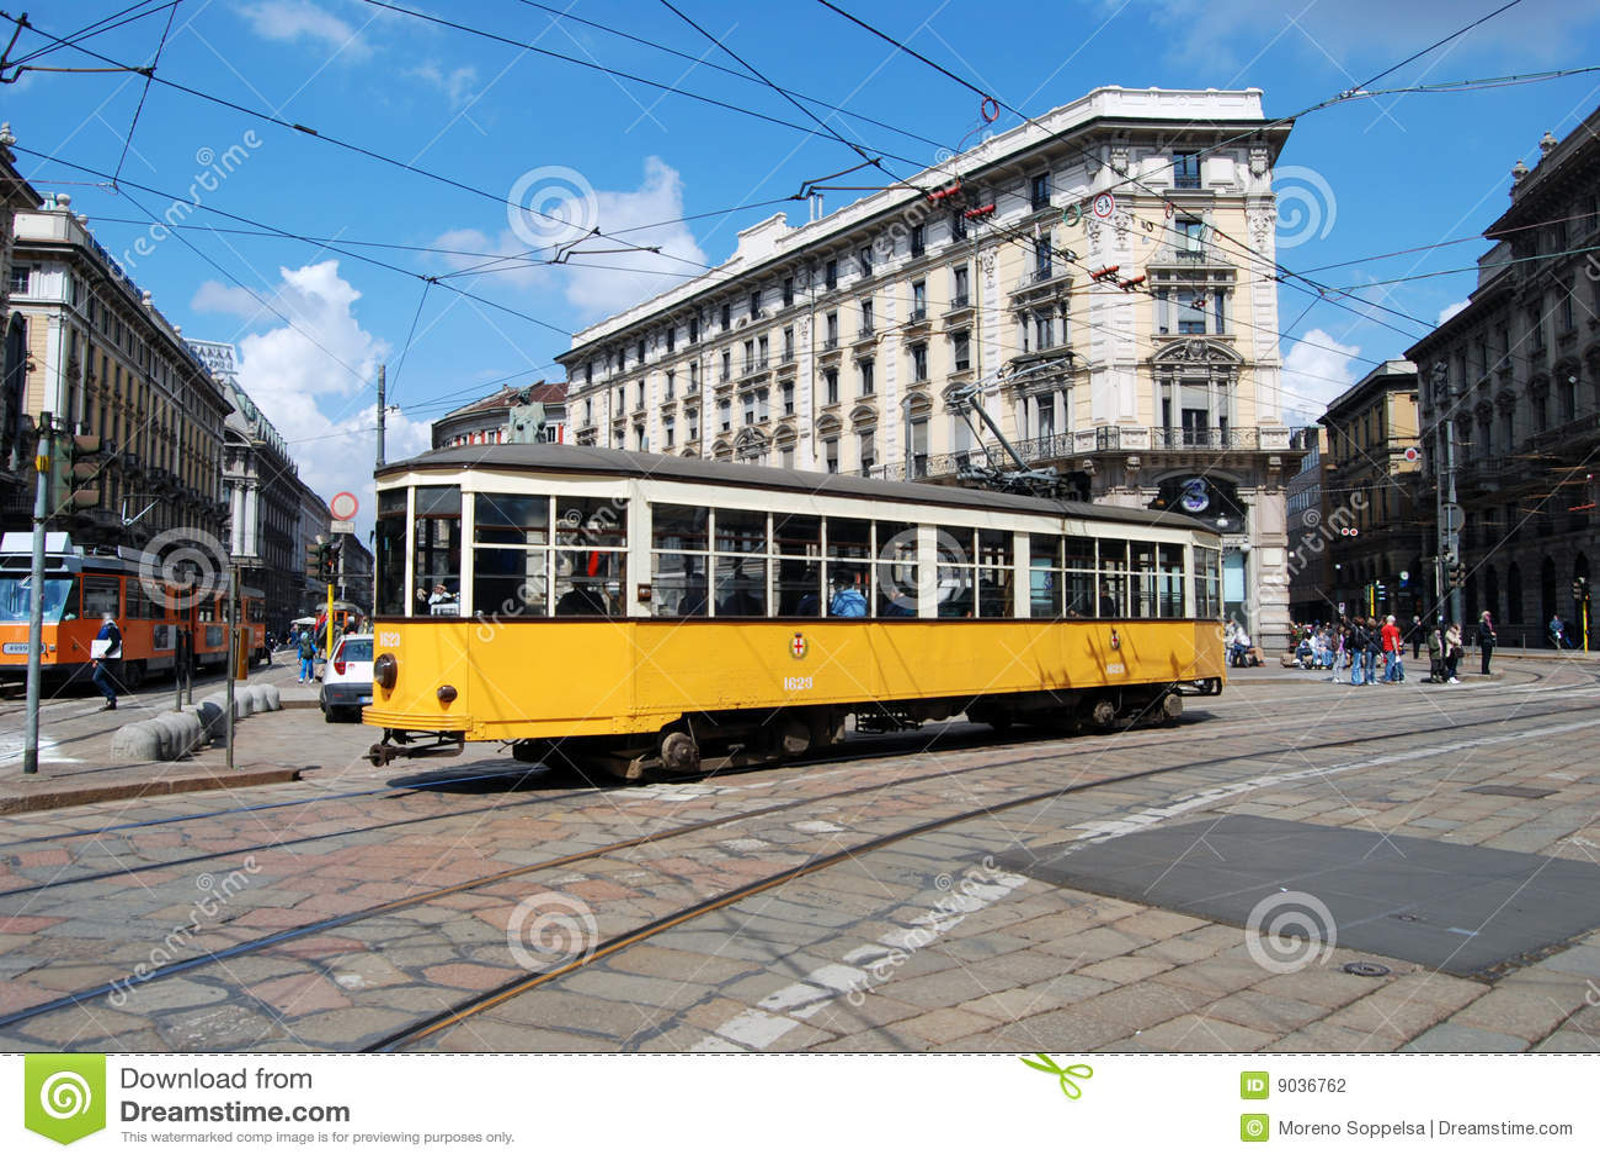 Typical tram (tramcar, trolley) in Milan square